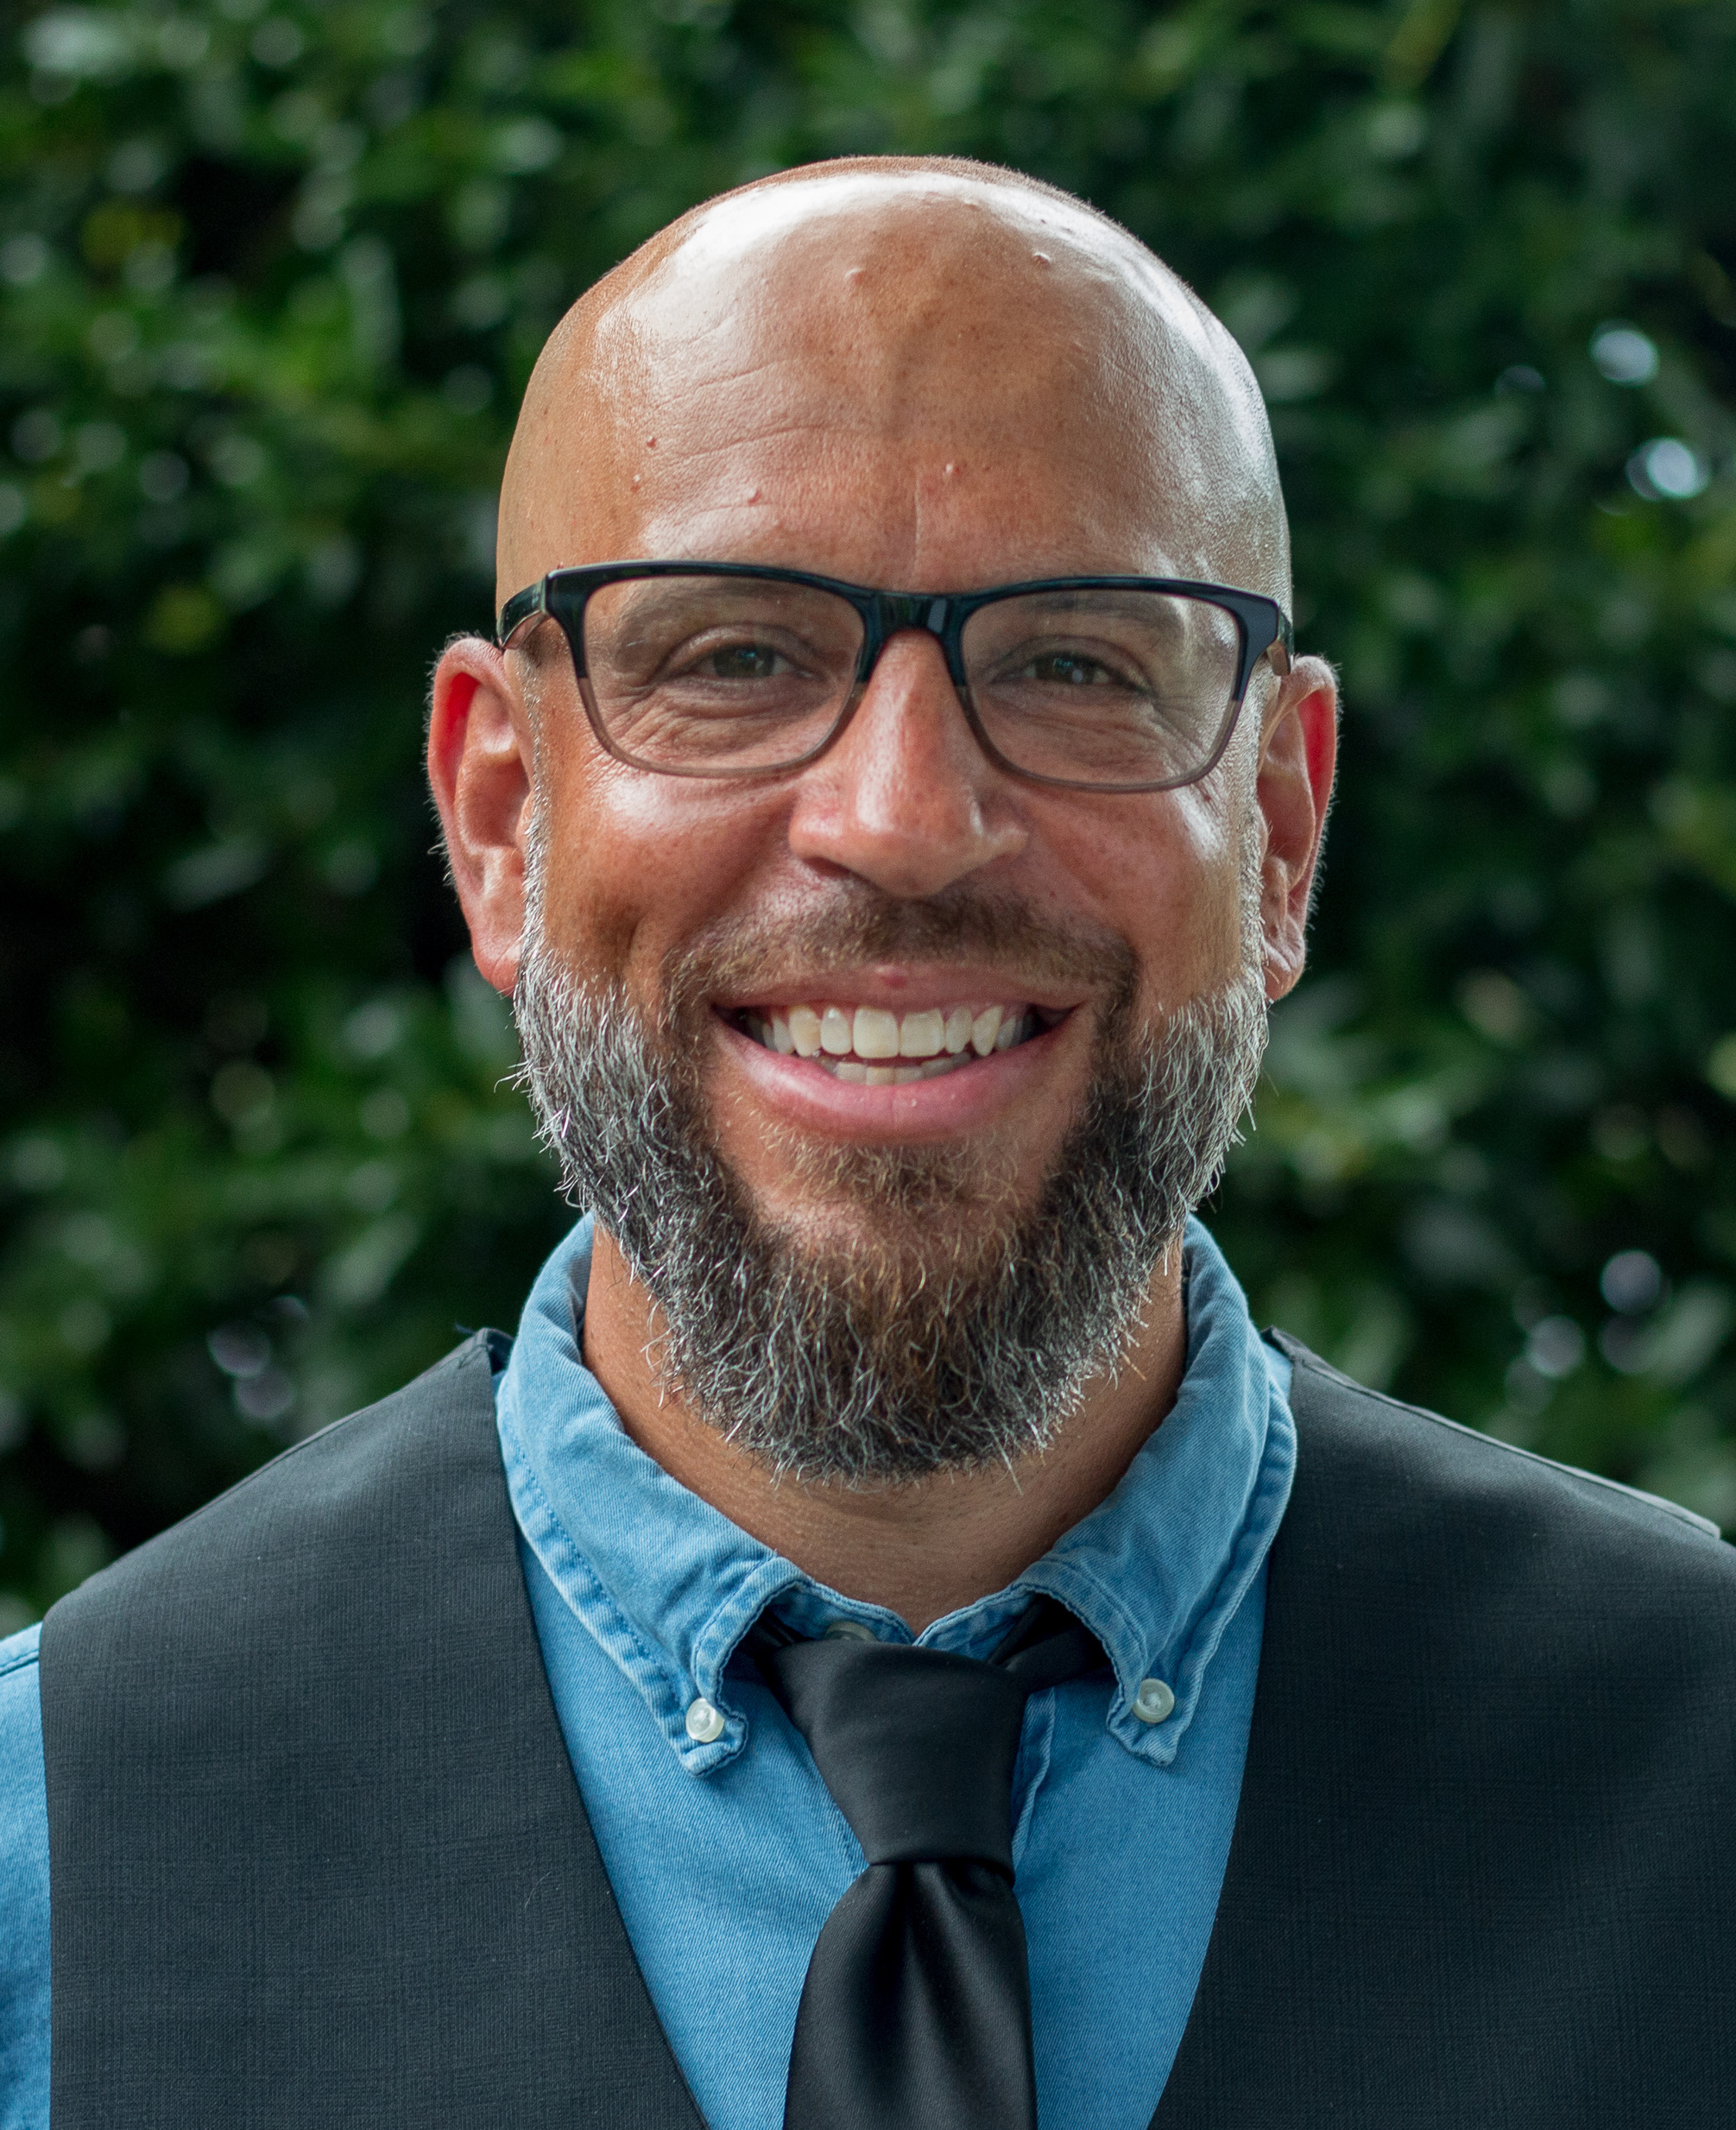 headshot of pastor/author Tony Merida